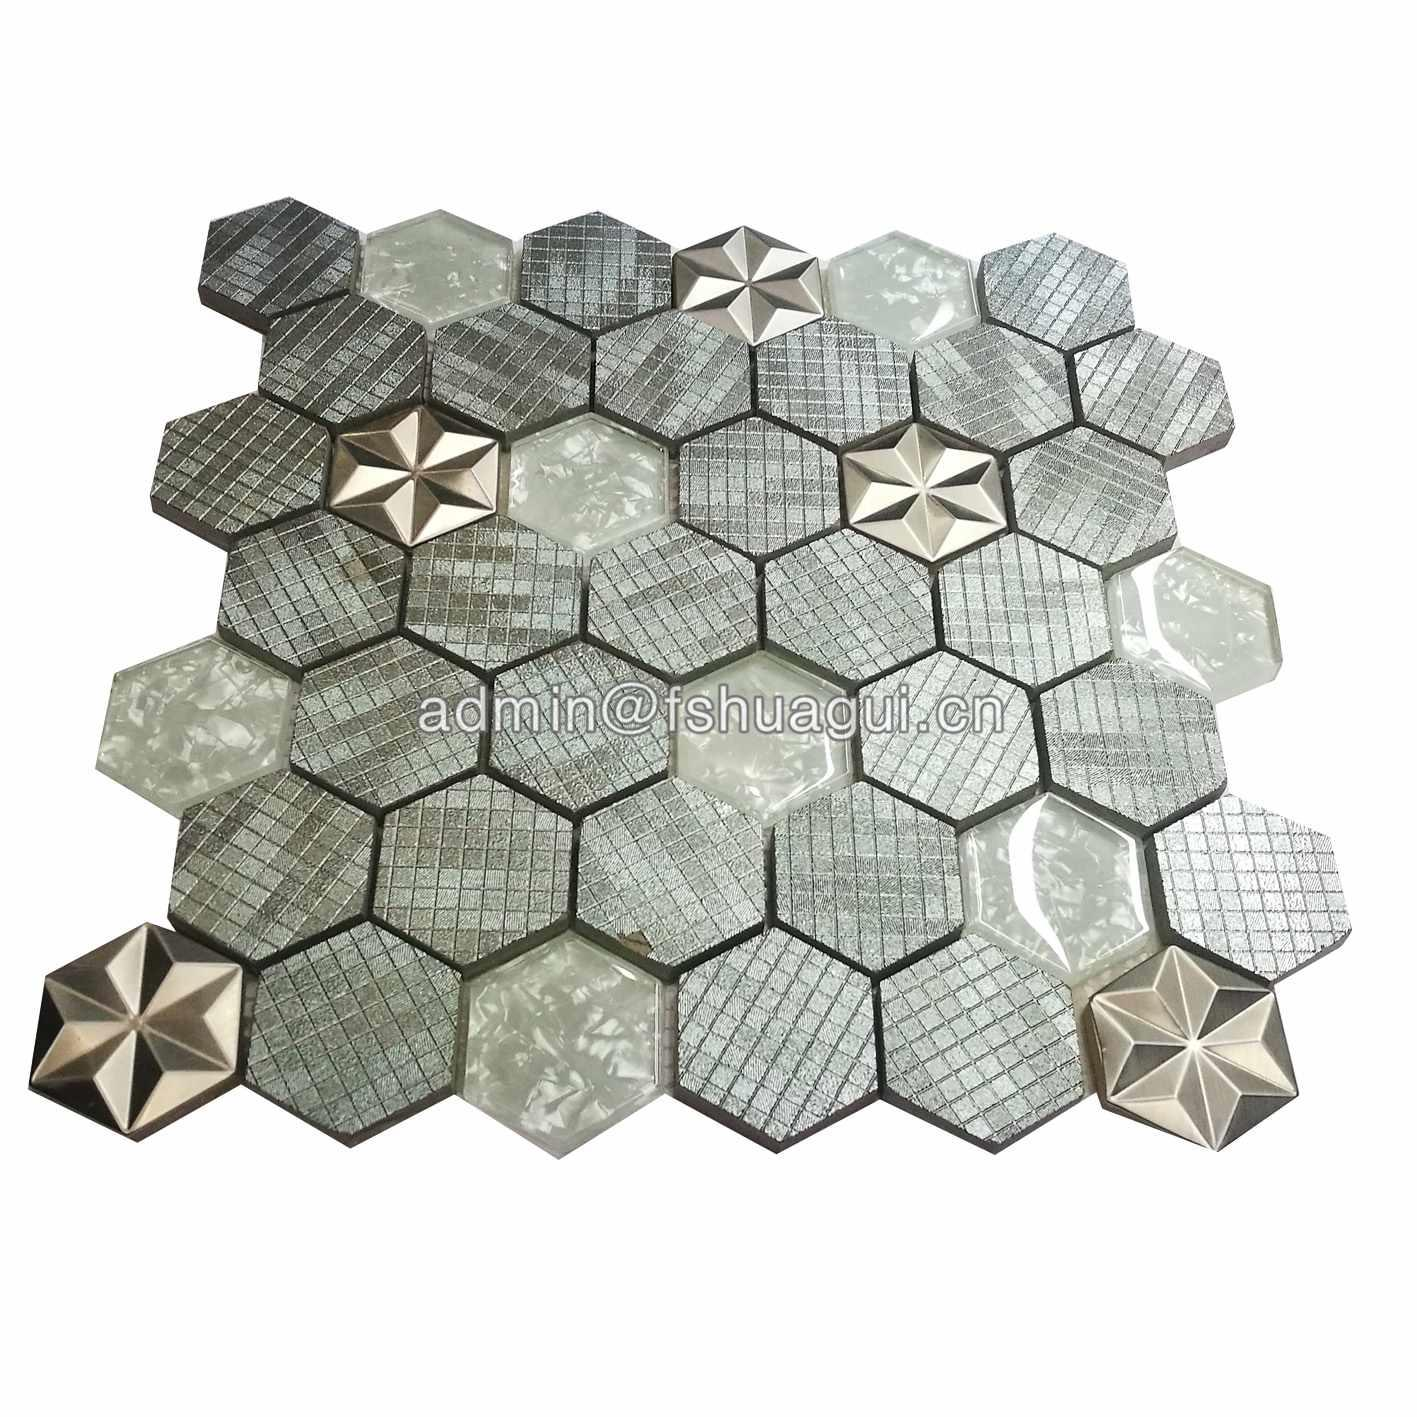 New Design Hexagon Art pattern Mosaic Tile Supply